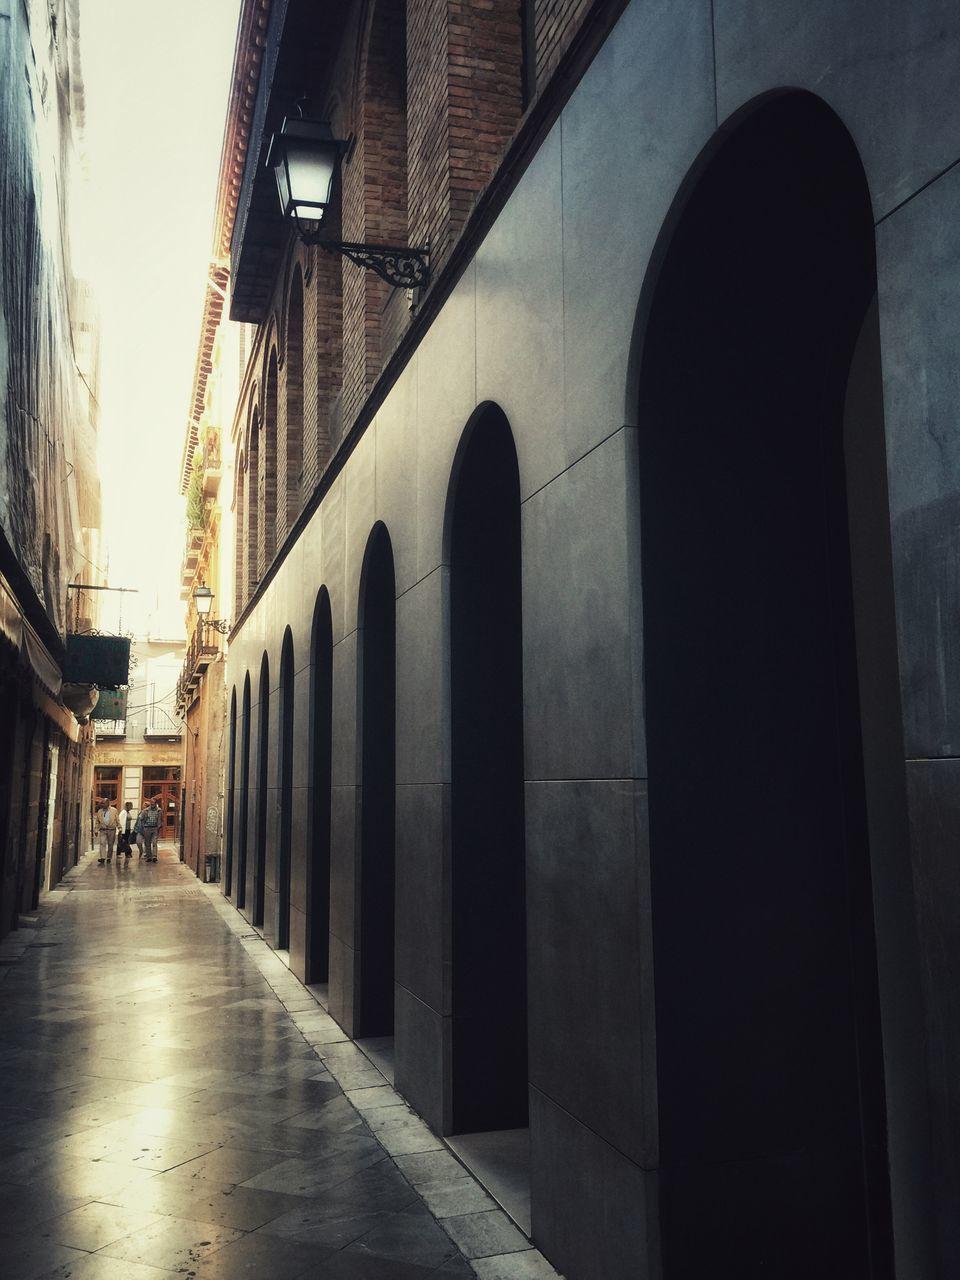 REAR VIEW OF MAN WALKING ON FOOTPATH AMIDST BUILDINGS